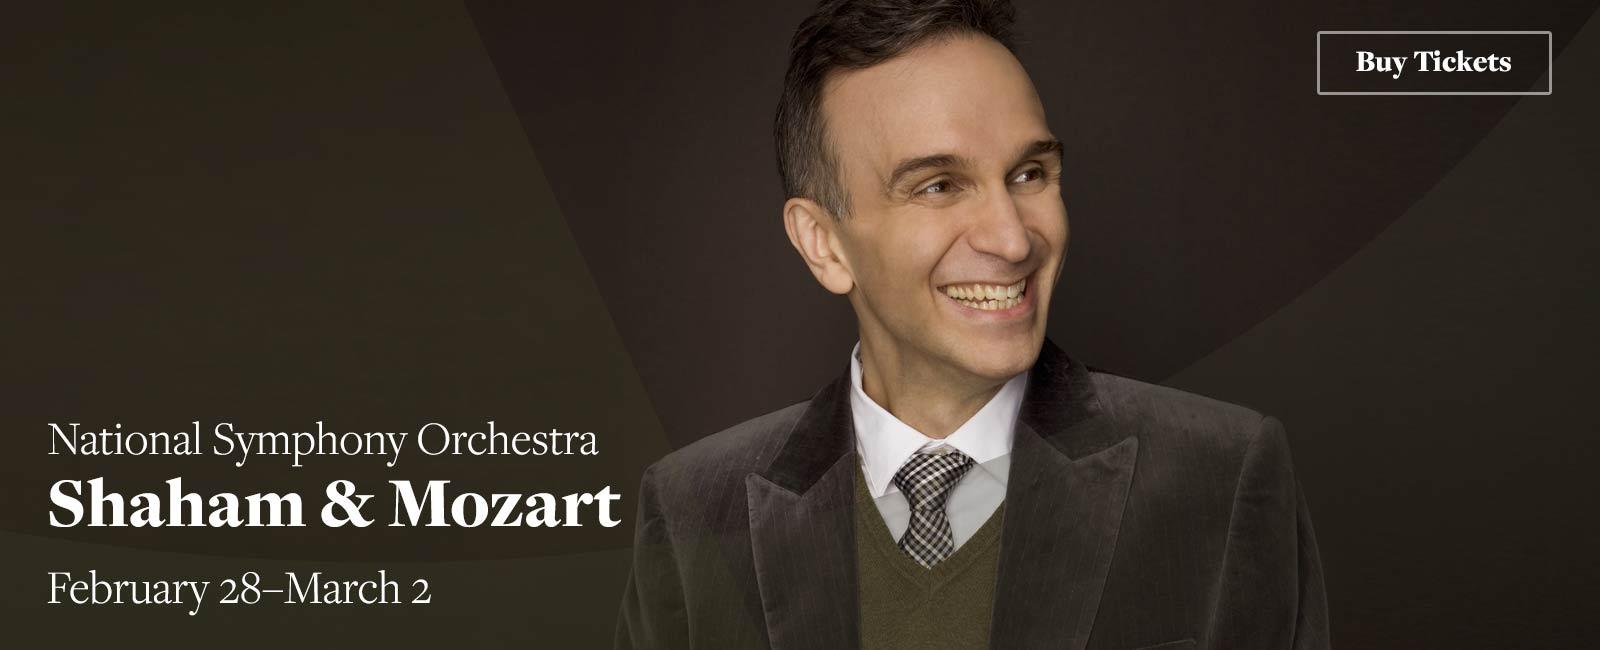 National Symphony Orchestra: Shaham & Mozart